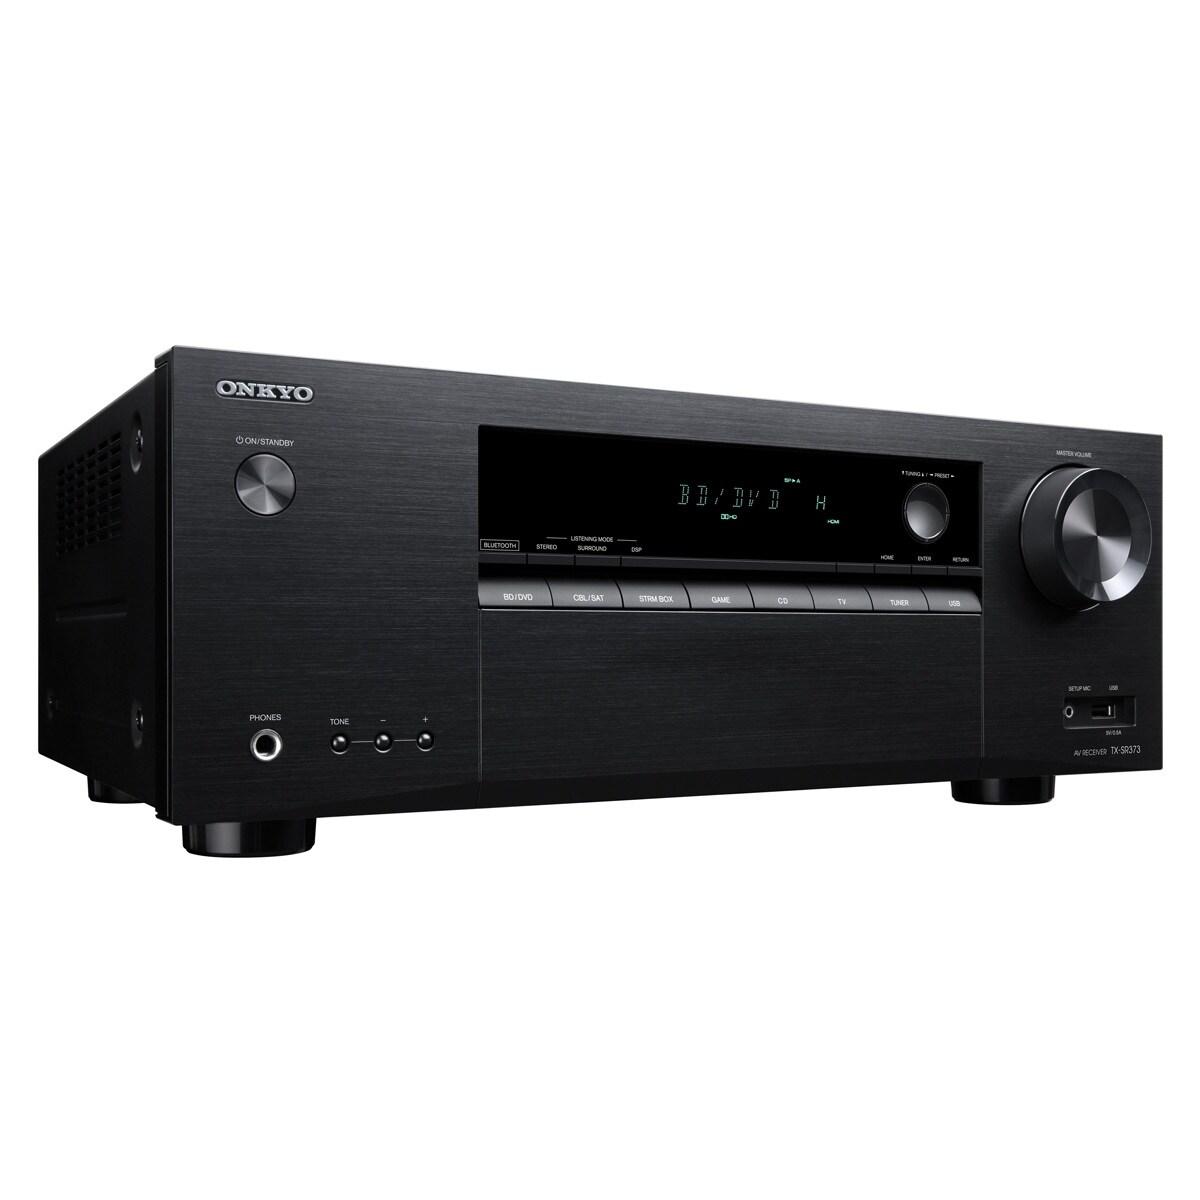 Onkyo TX-SR373 5 2 Channel A/V Receiver